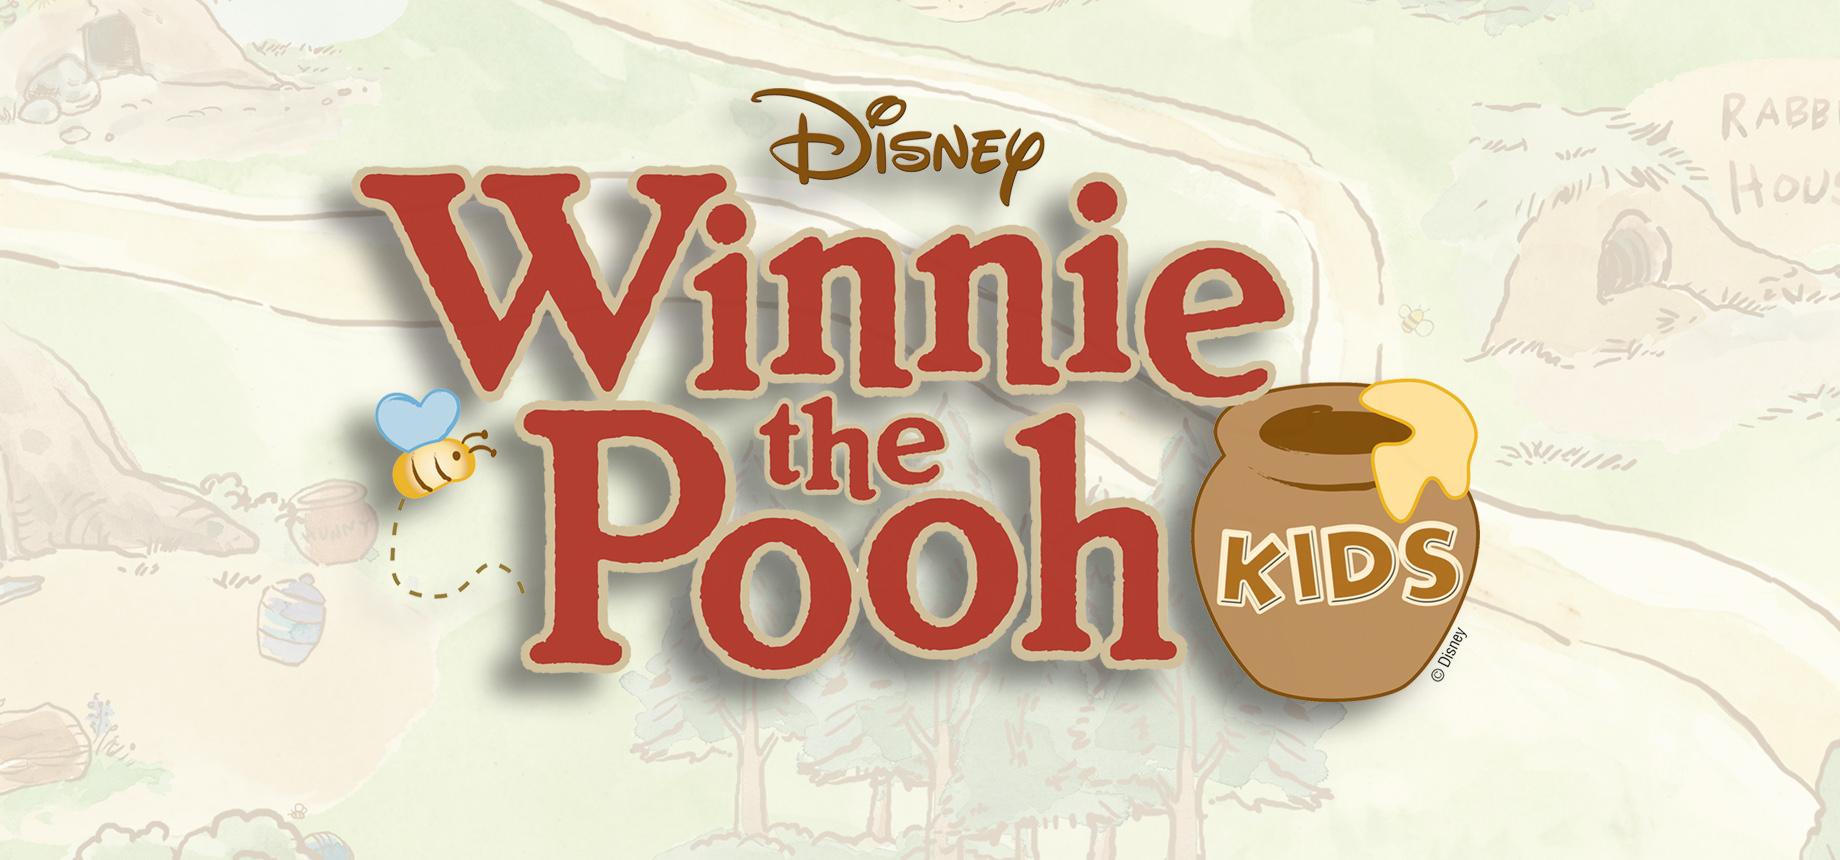 Winnie the Pooh Kids.jpg